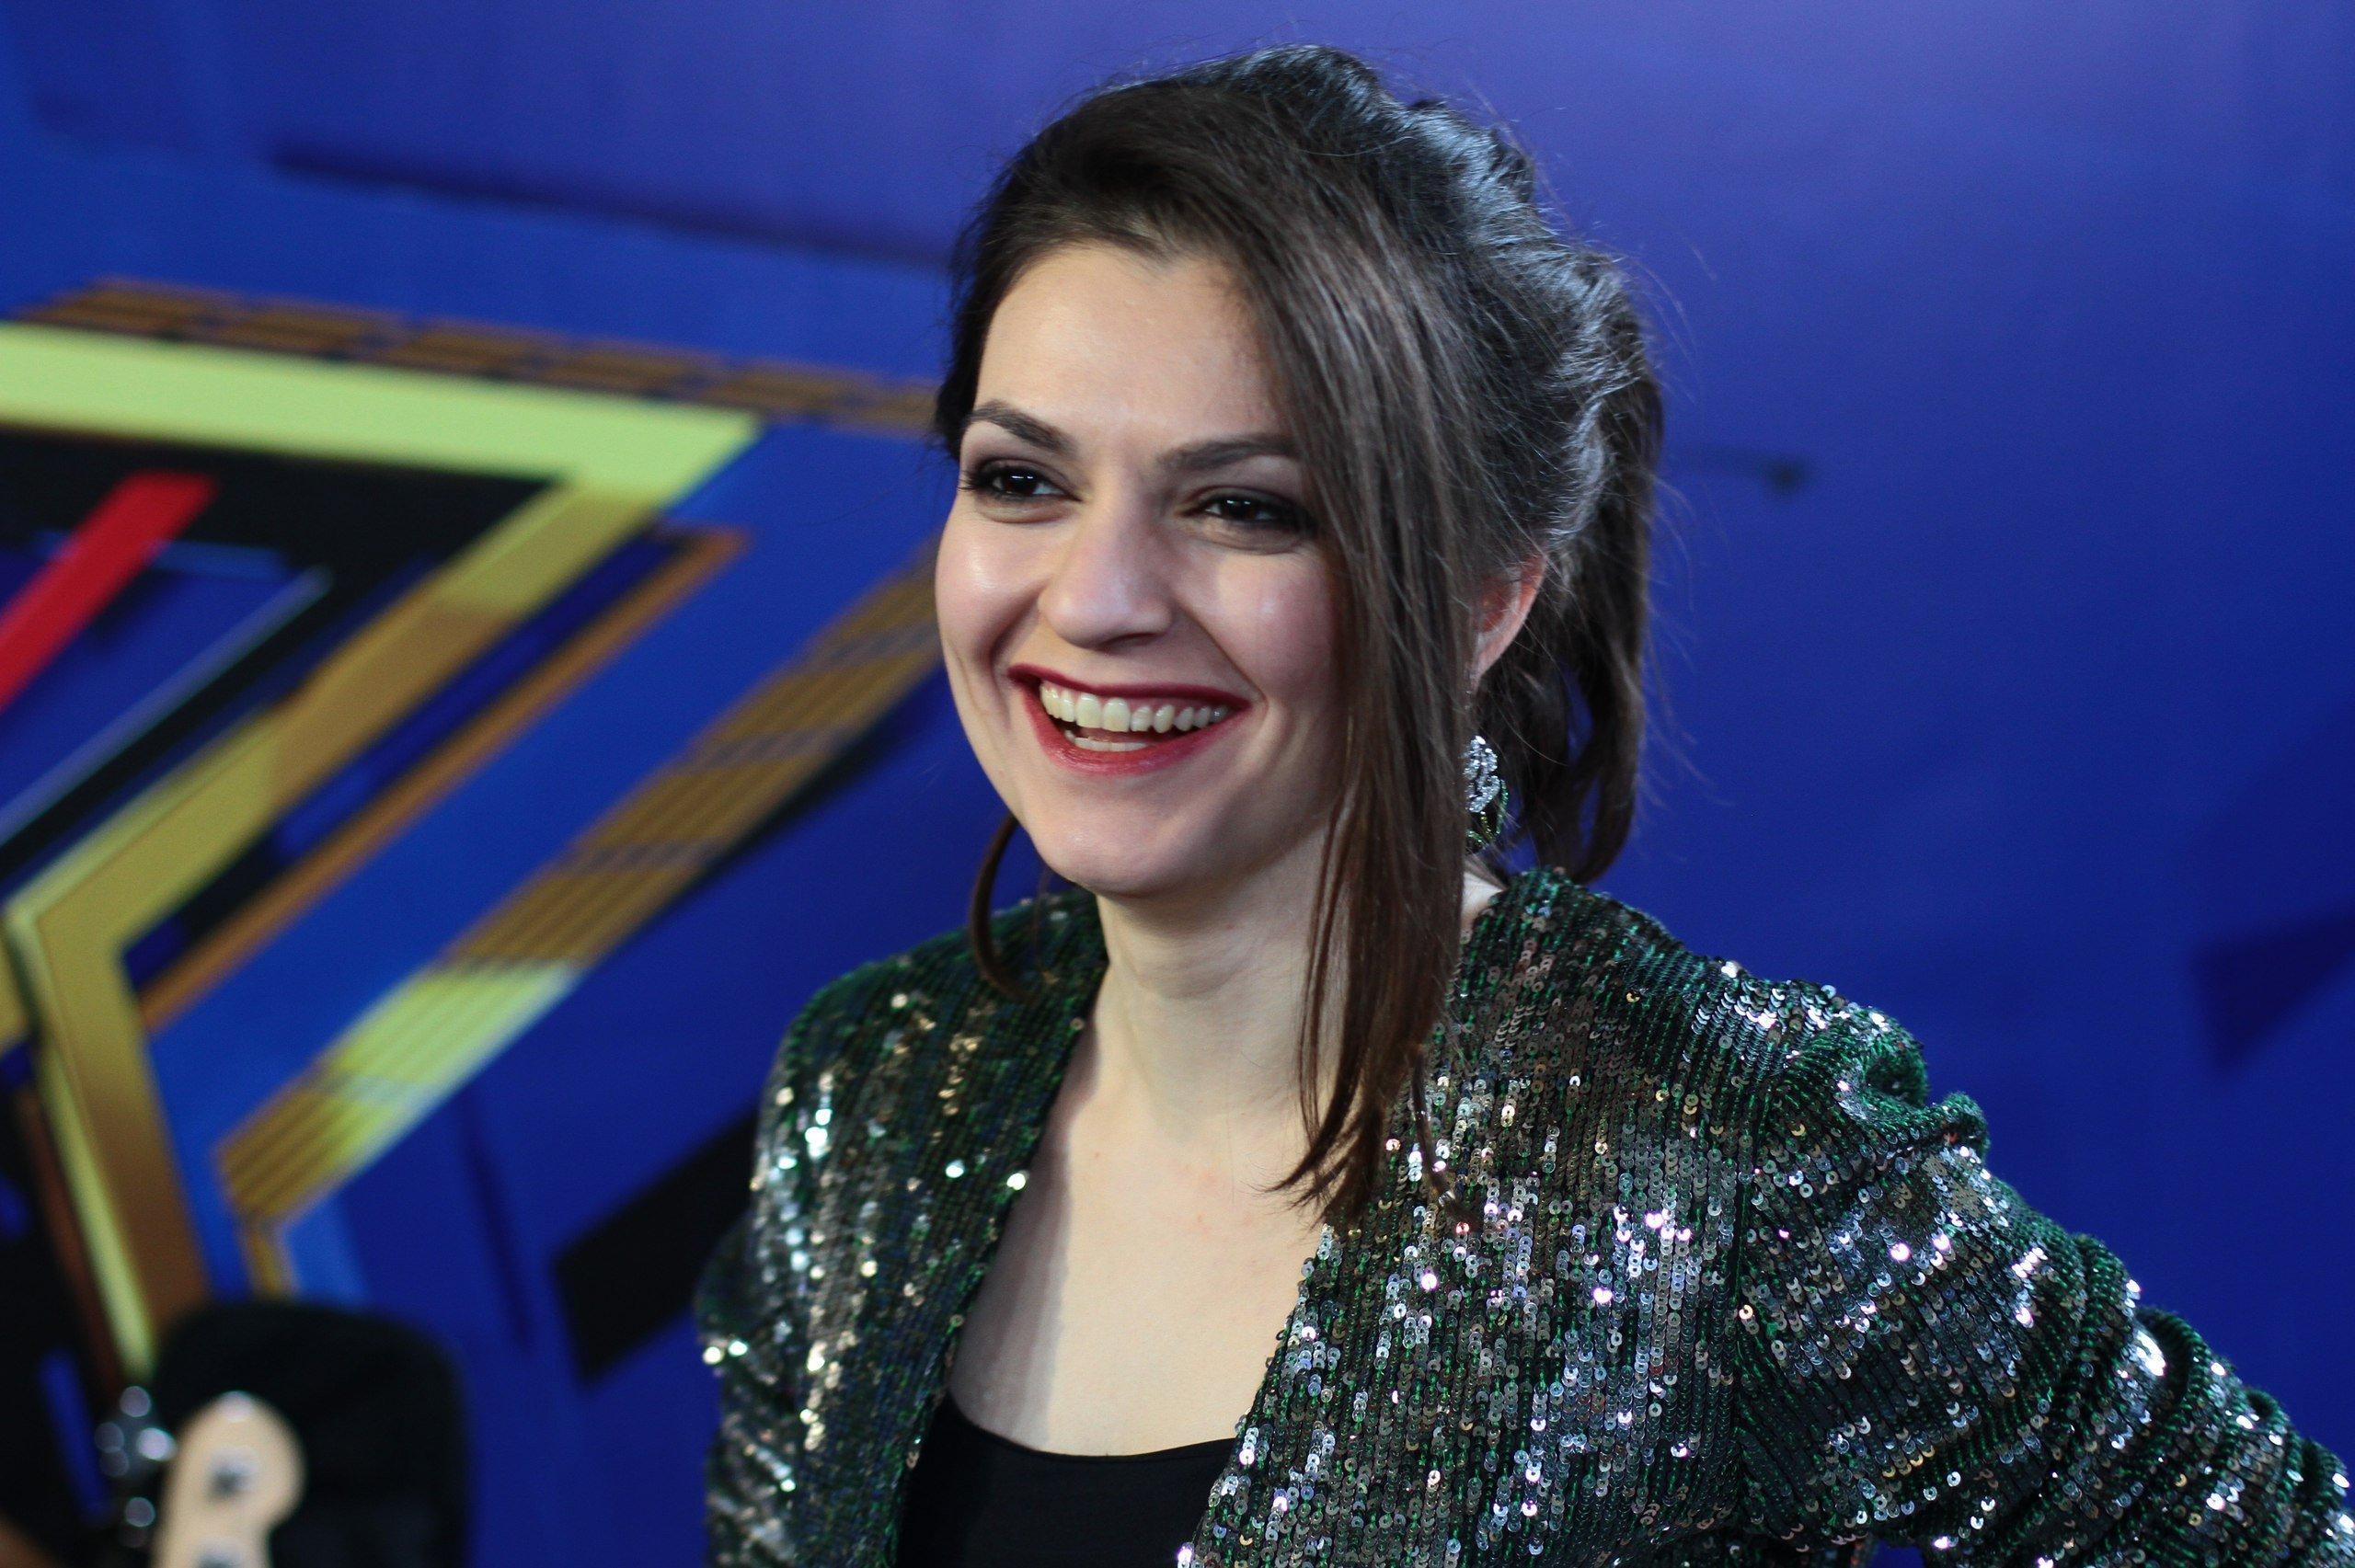 Участница проекта Новая звезда Фати Бесолти.